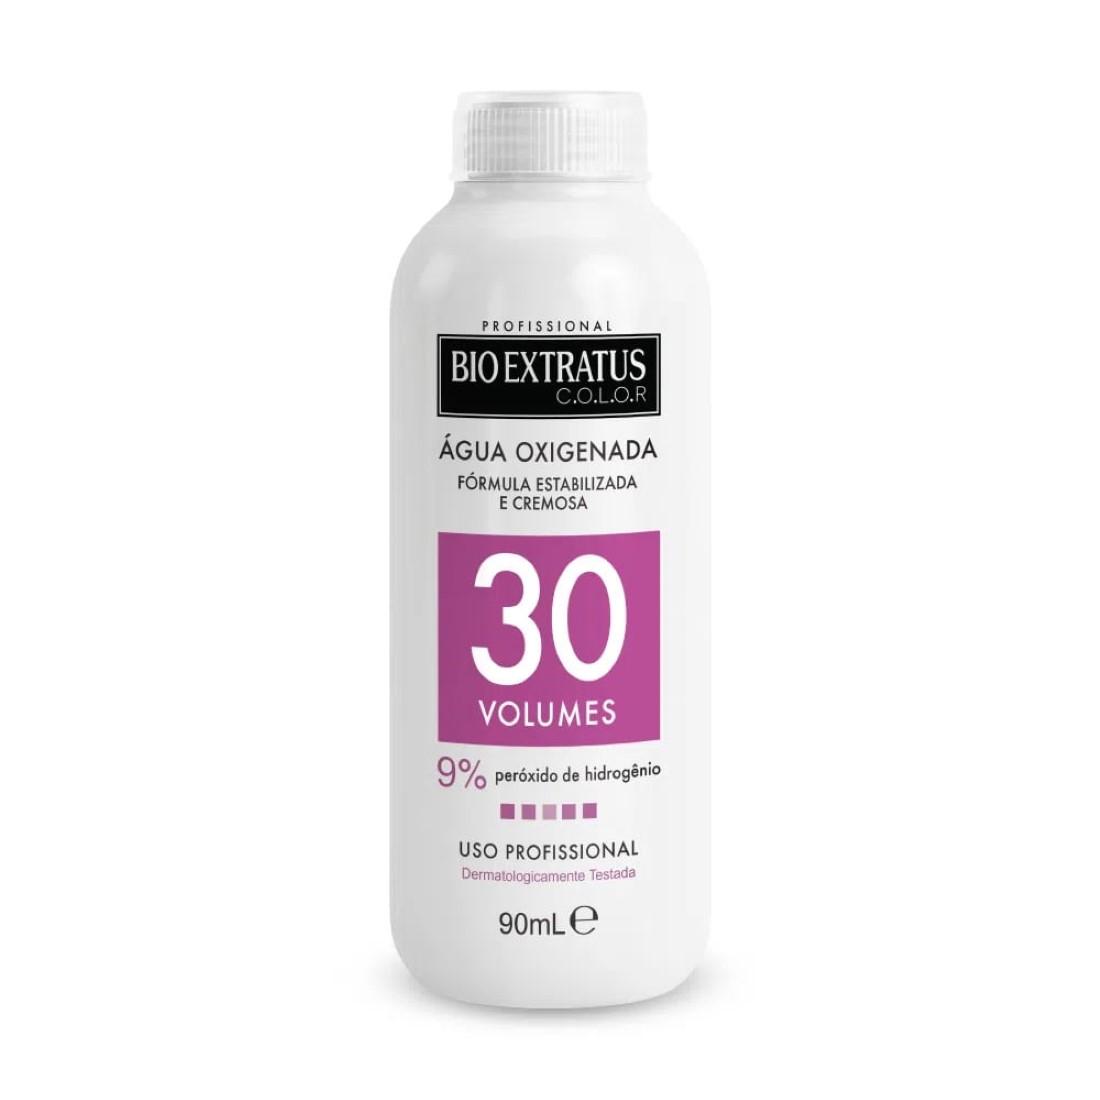 Água Oxigenada 30 Volumes 90ml - Bio Extratus